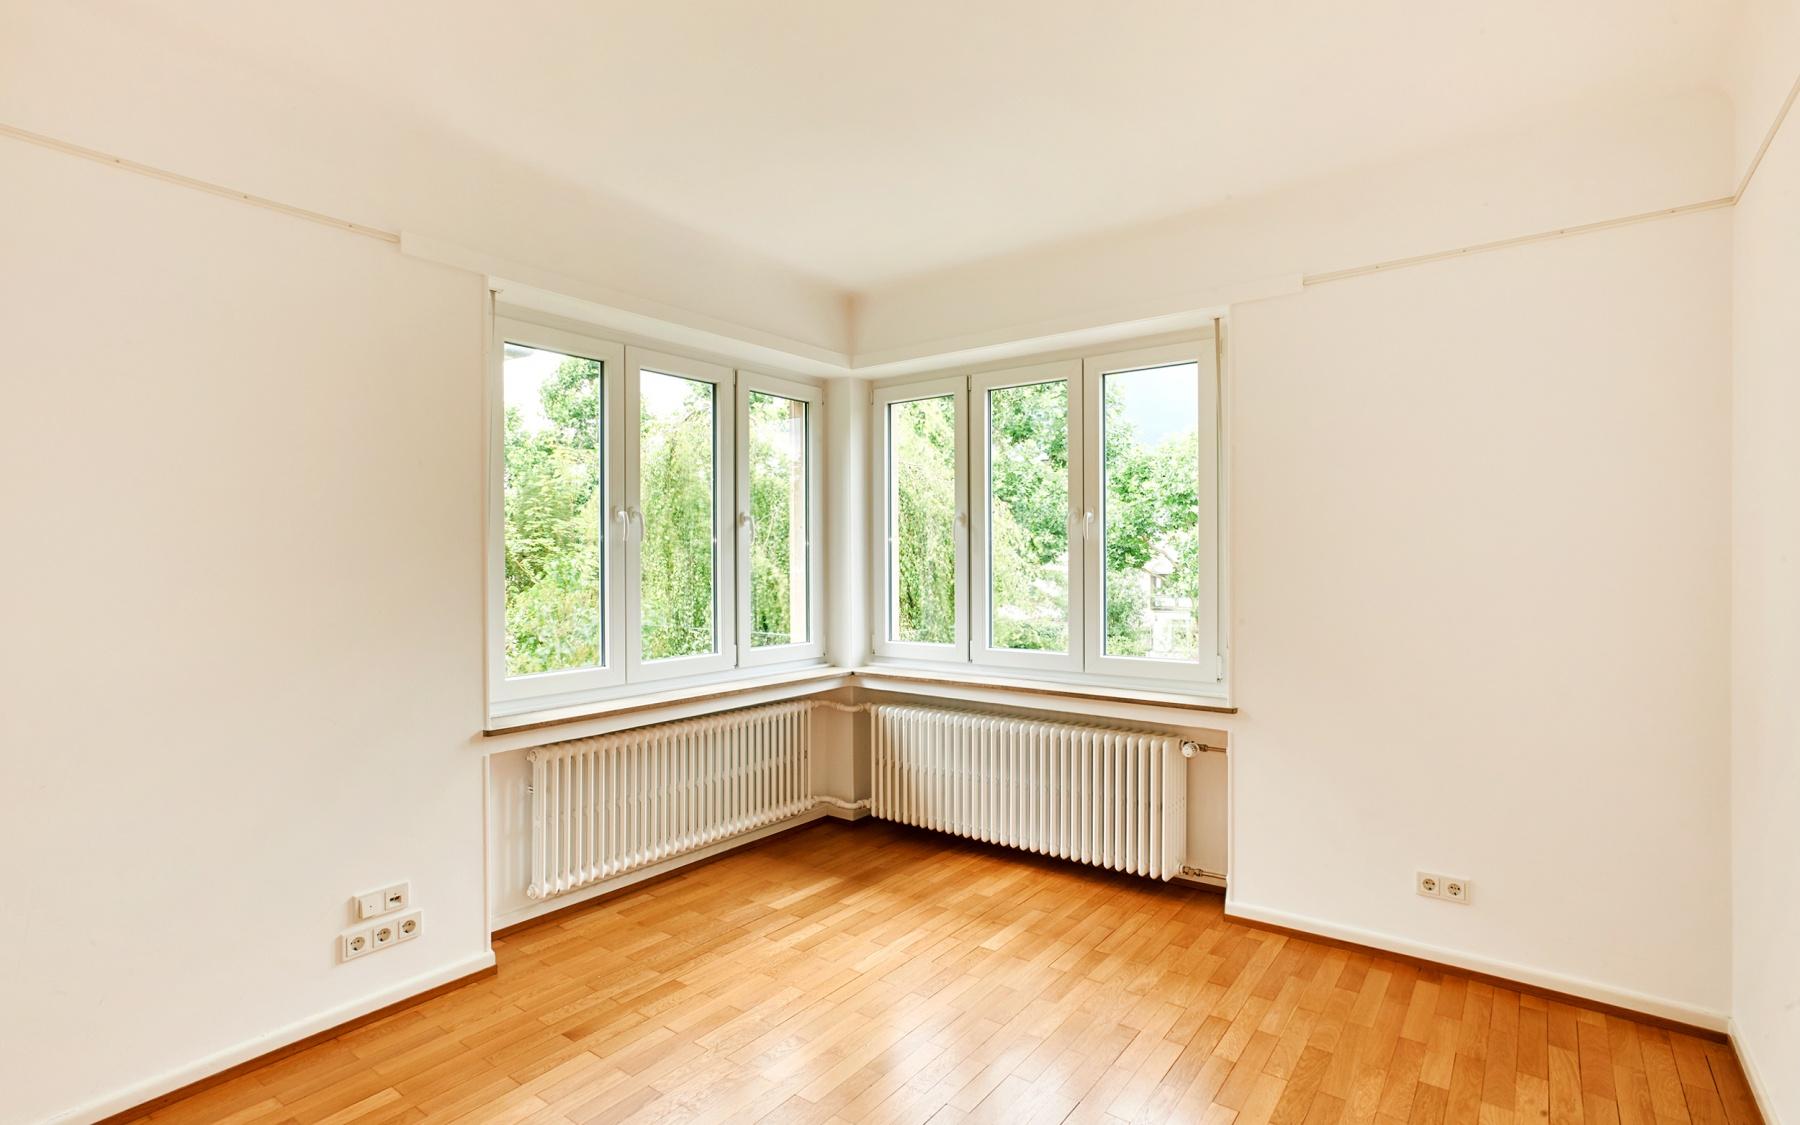 Maison à Luxembourg-Belair